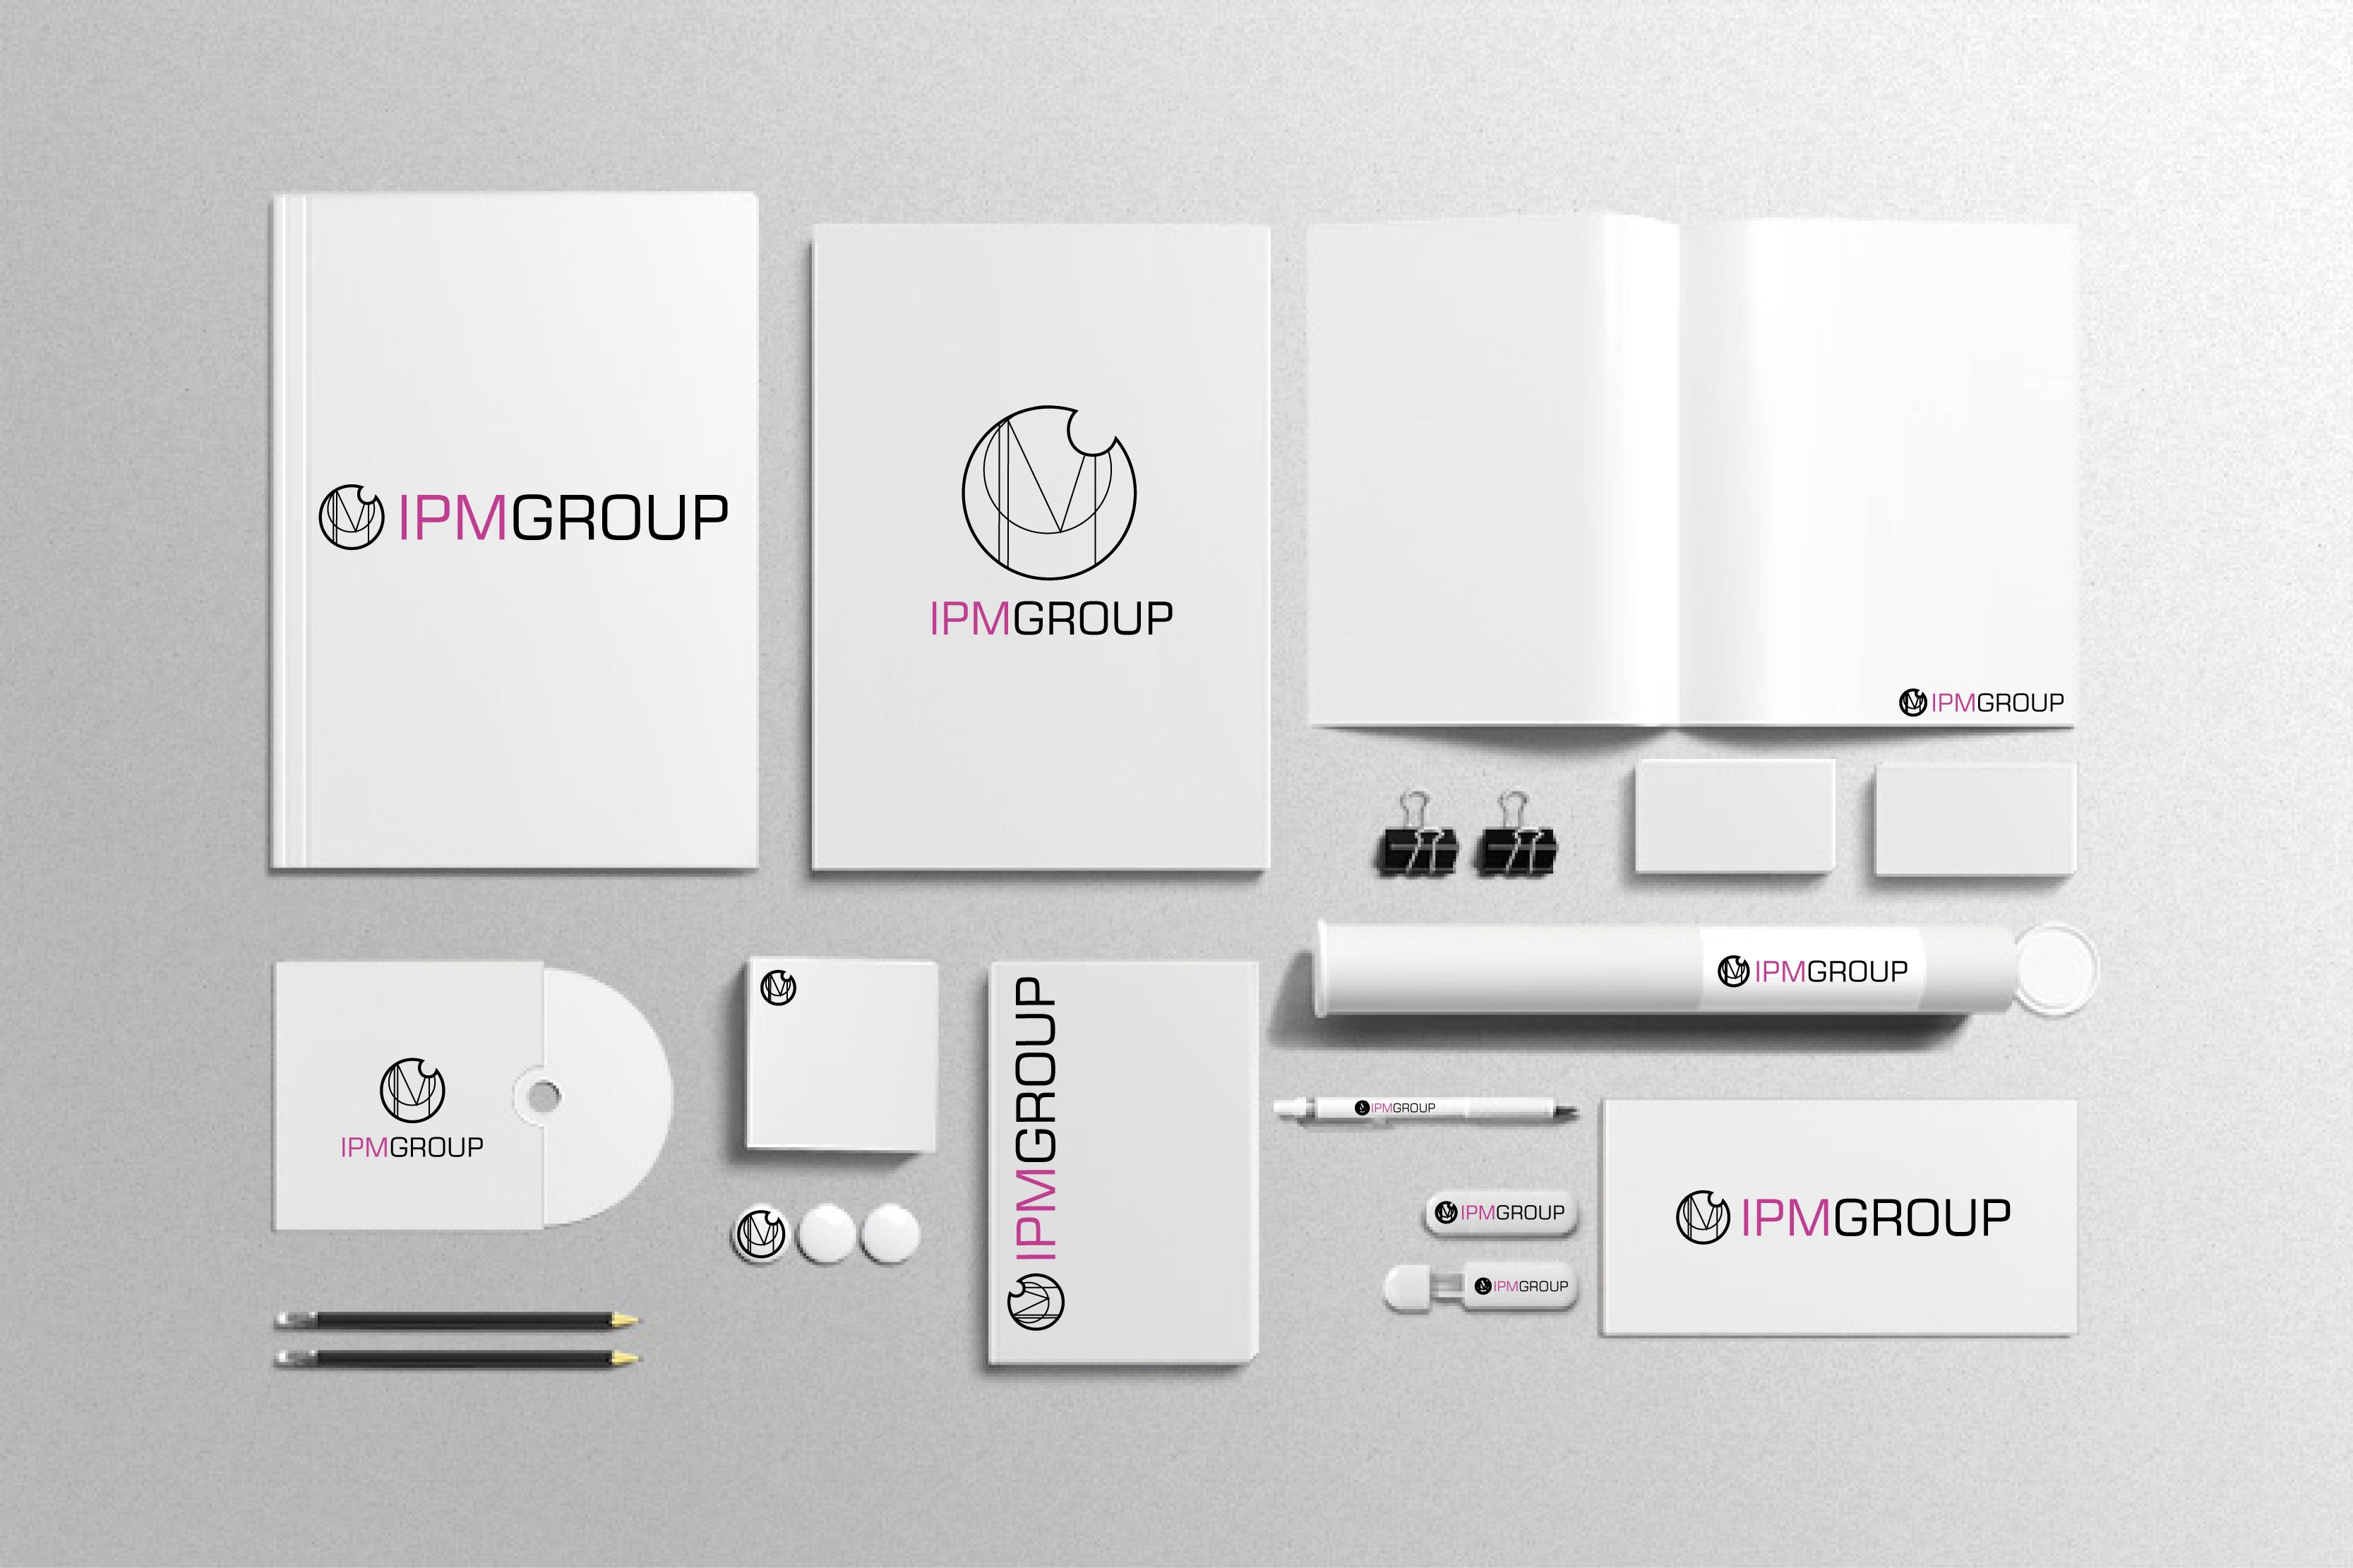 Разработка логотипа для управляющей компании фото f_4795f830a3c4438f.jpg